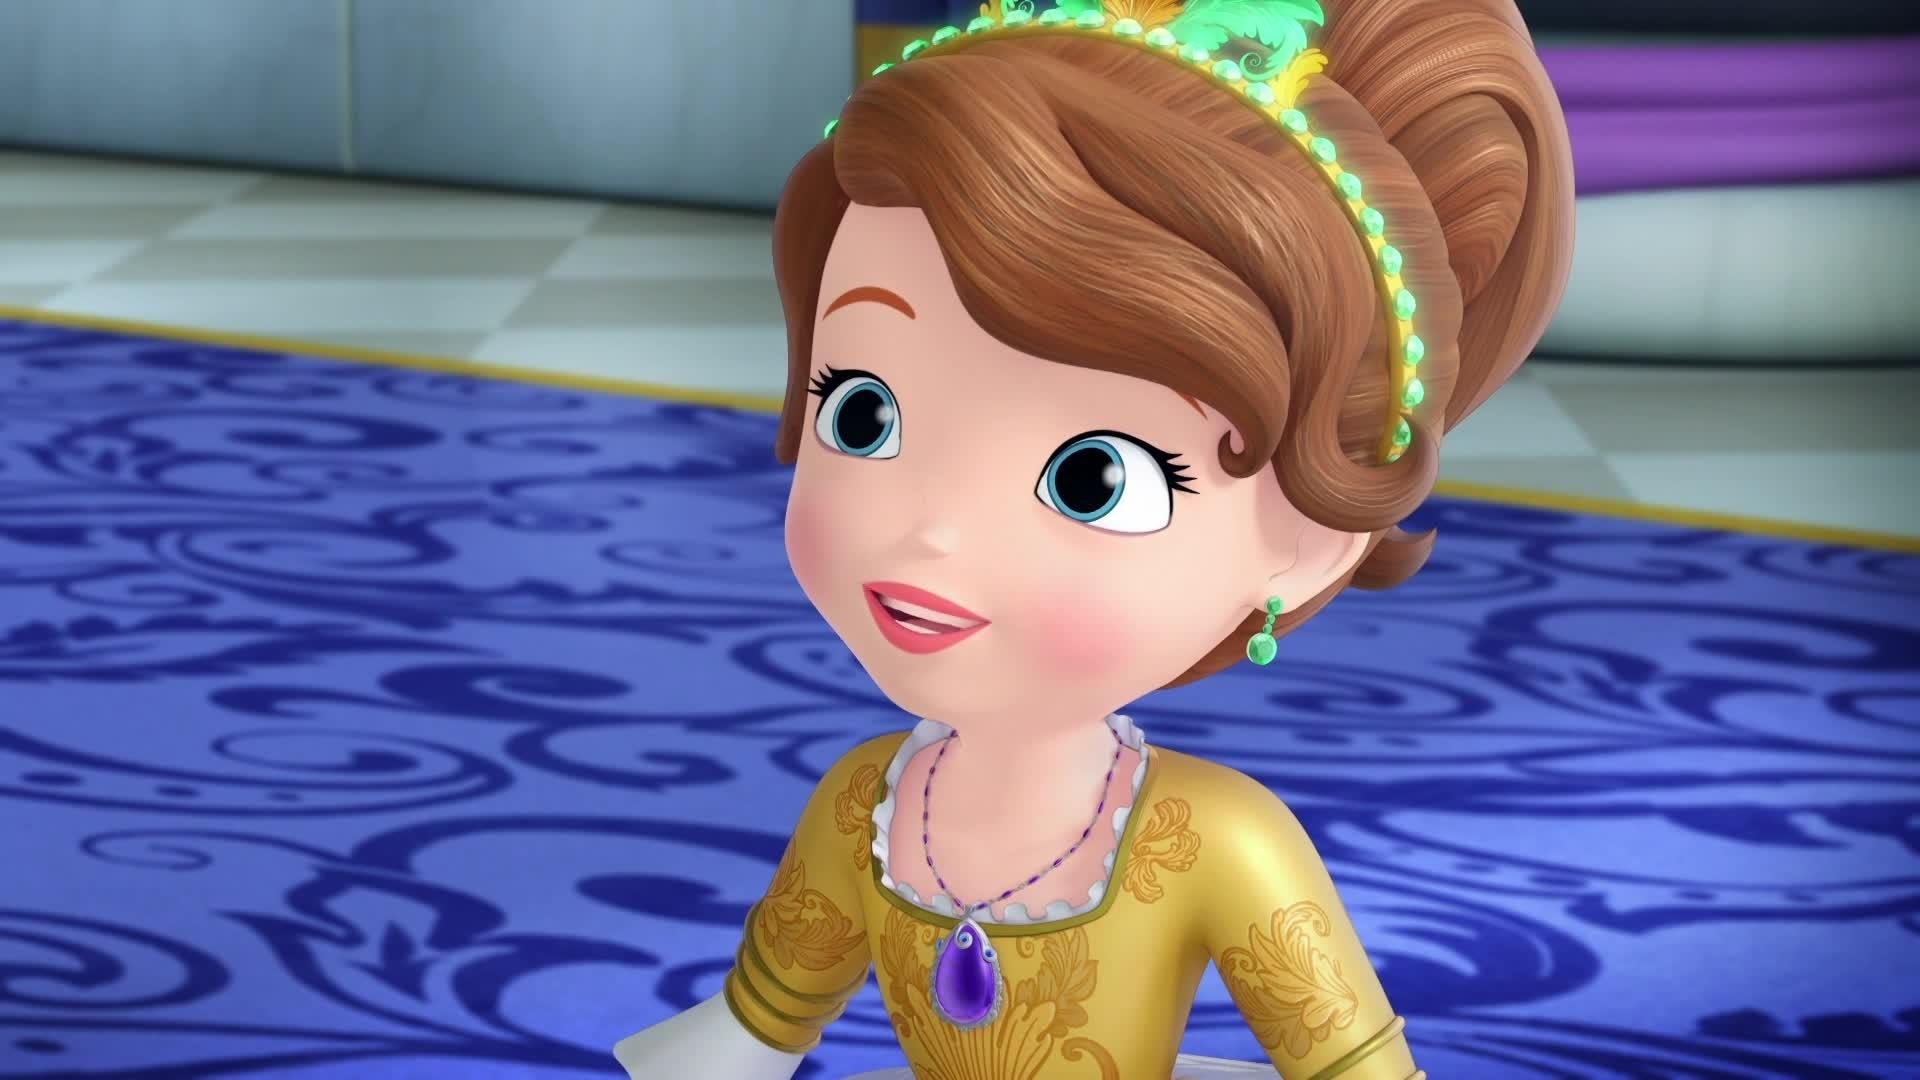 Princesse Sofia - Le cadeau idéal